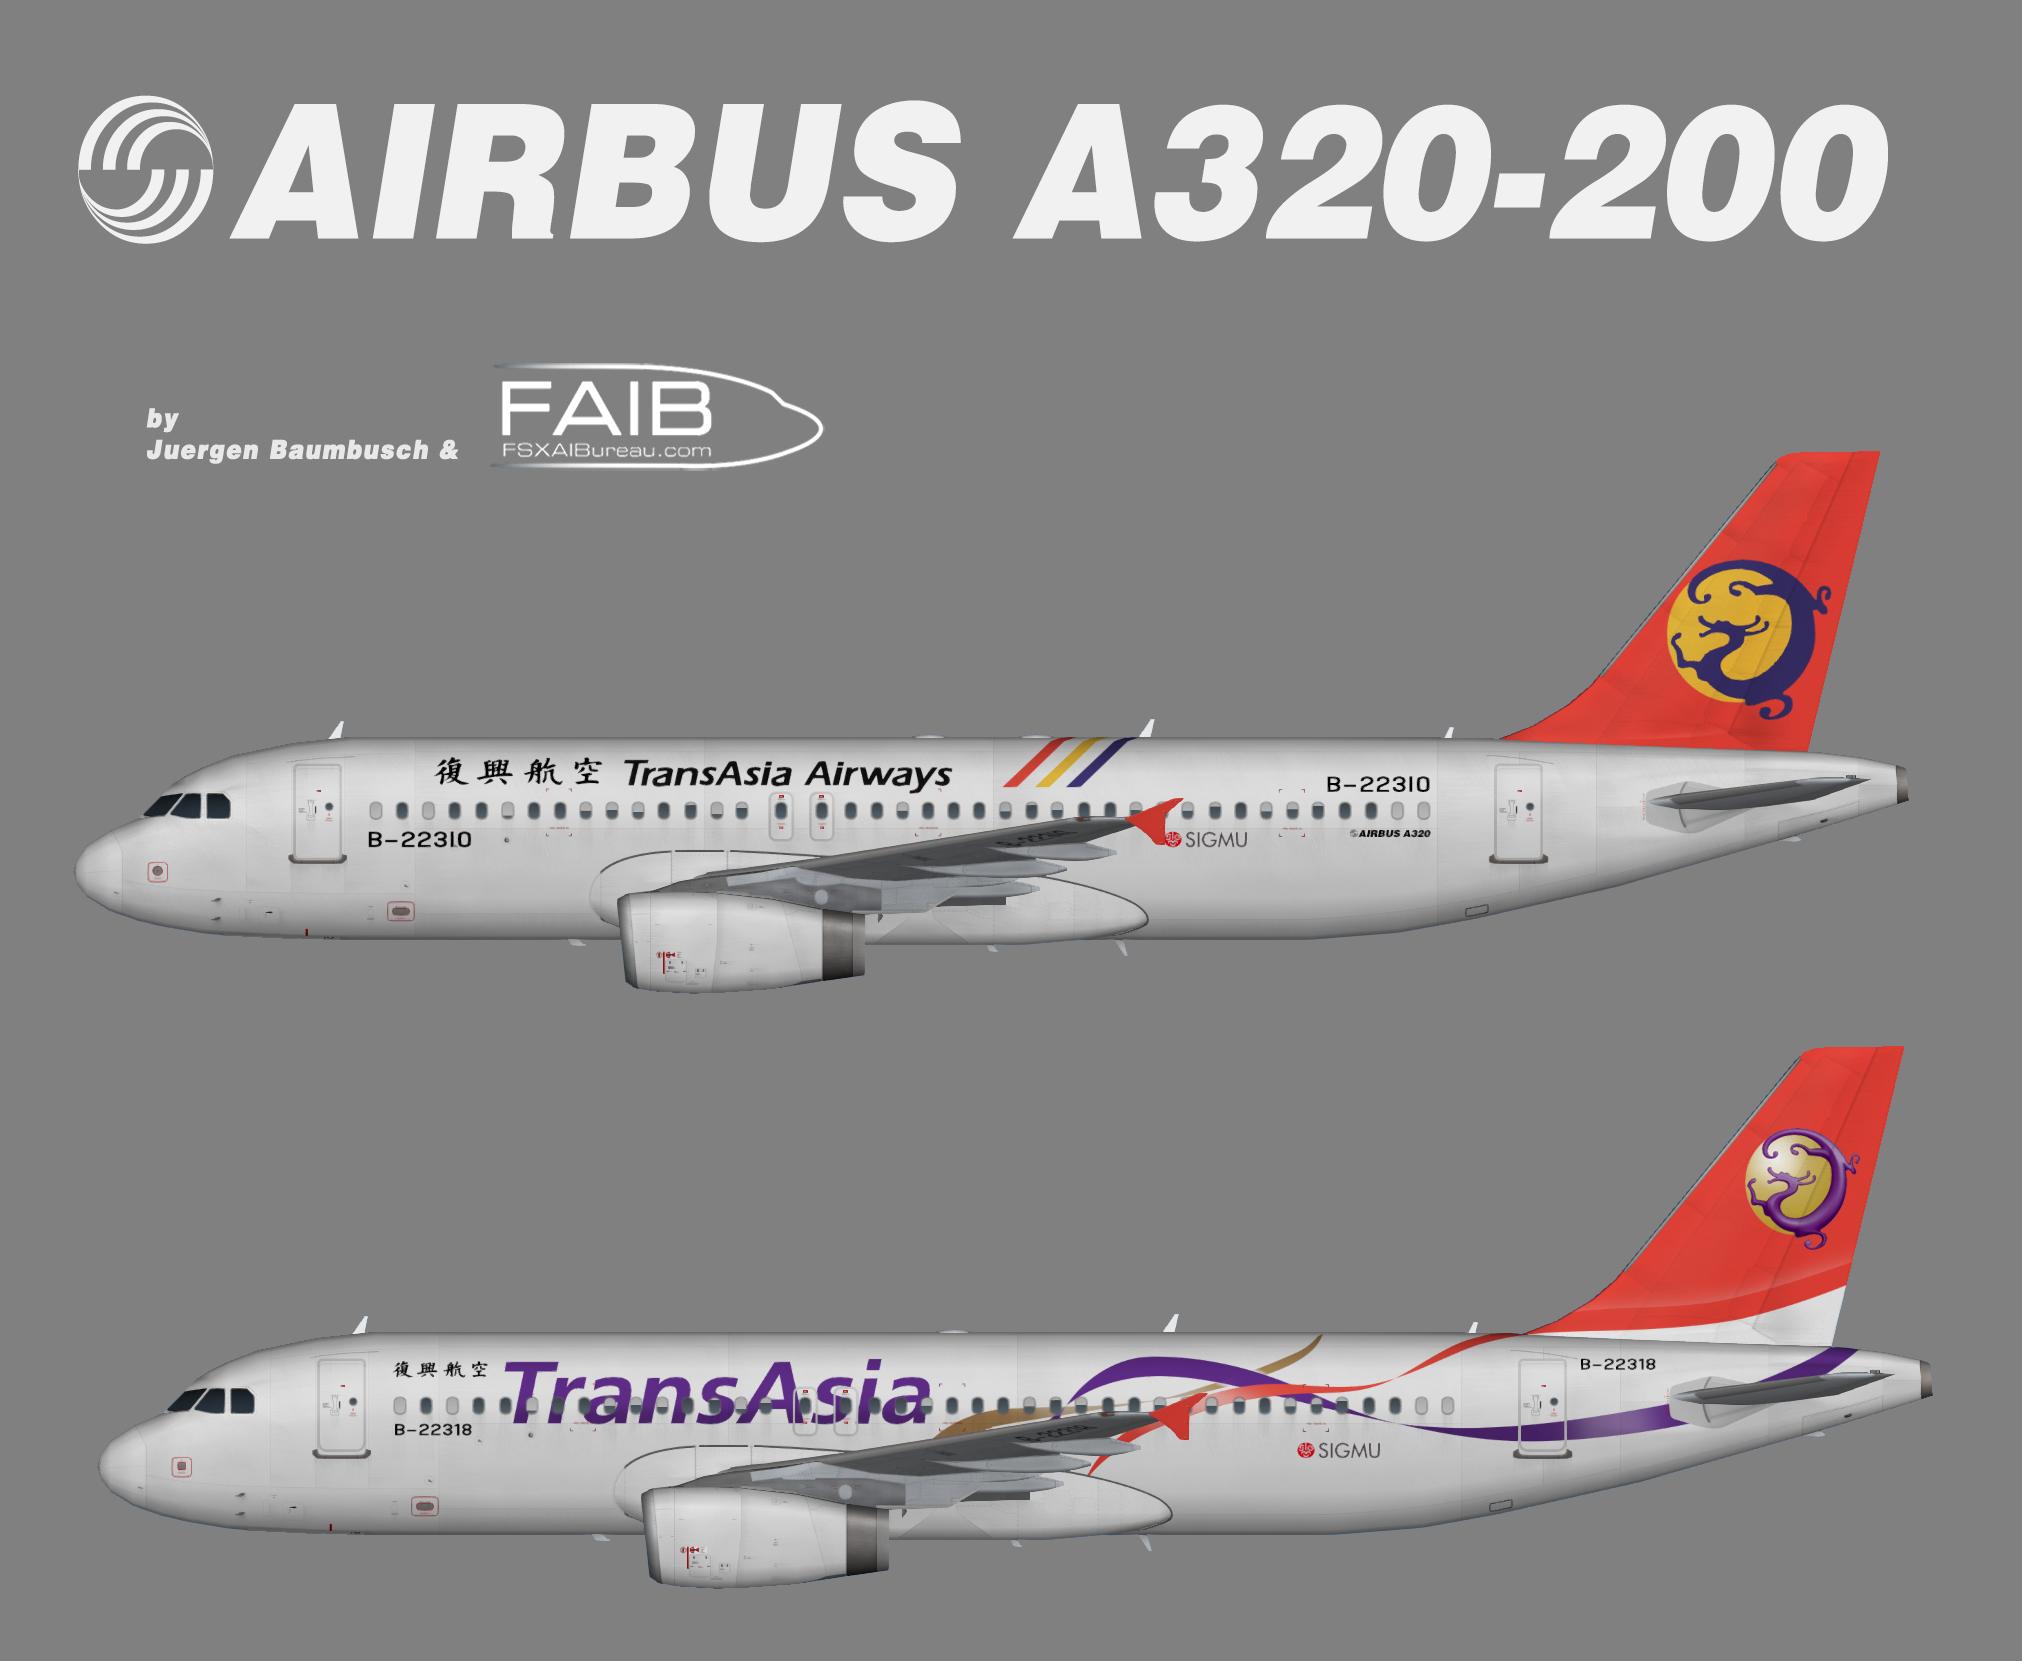 Схема airbus a320-200 qatar